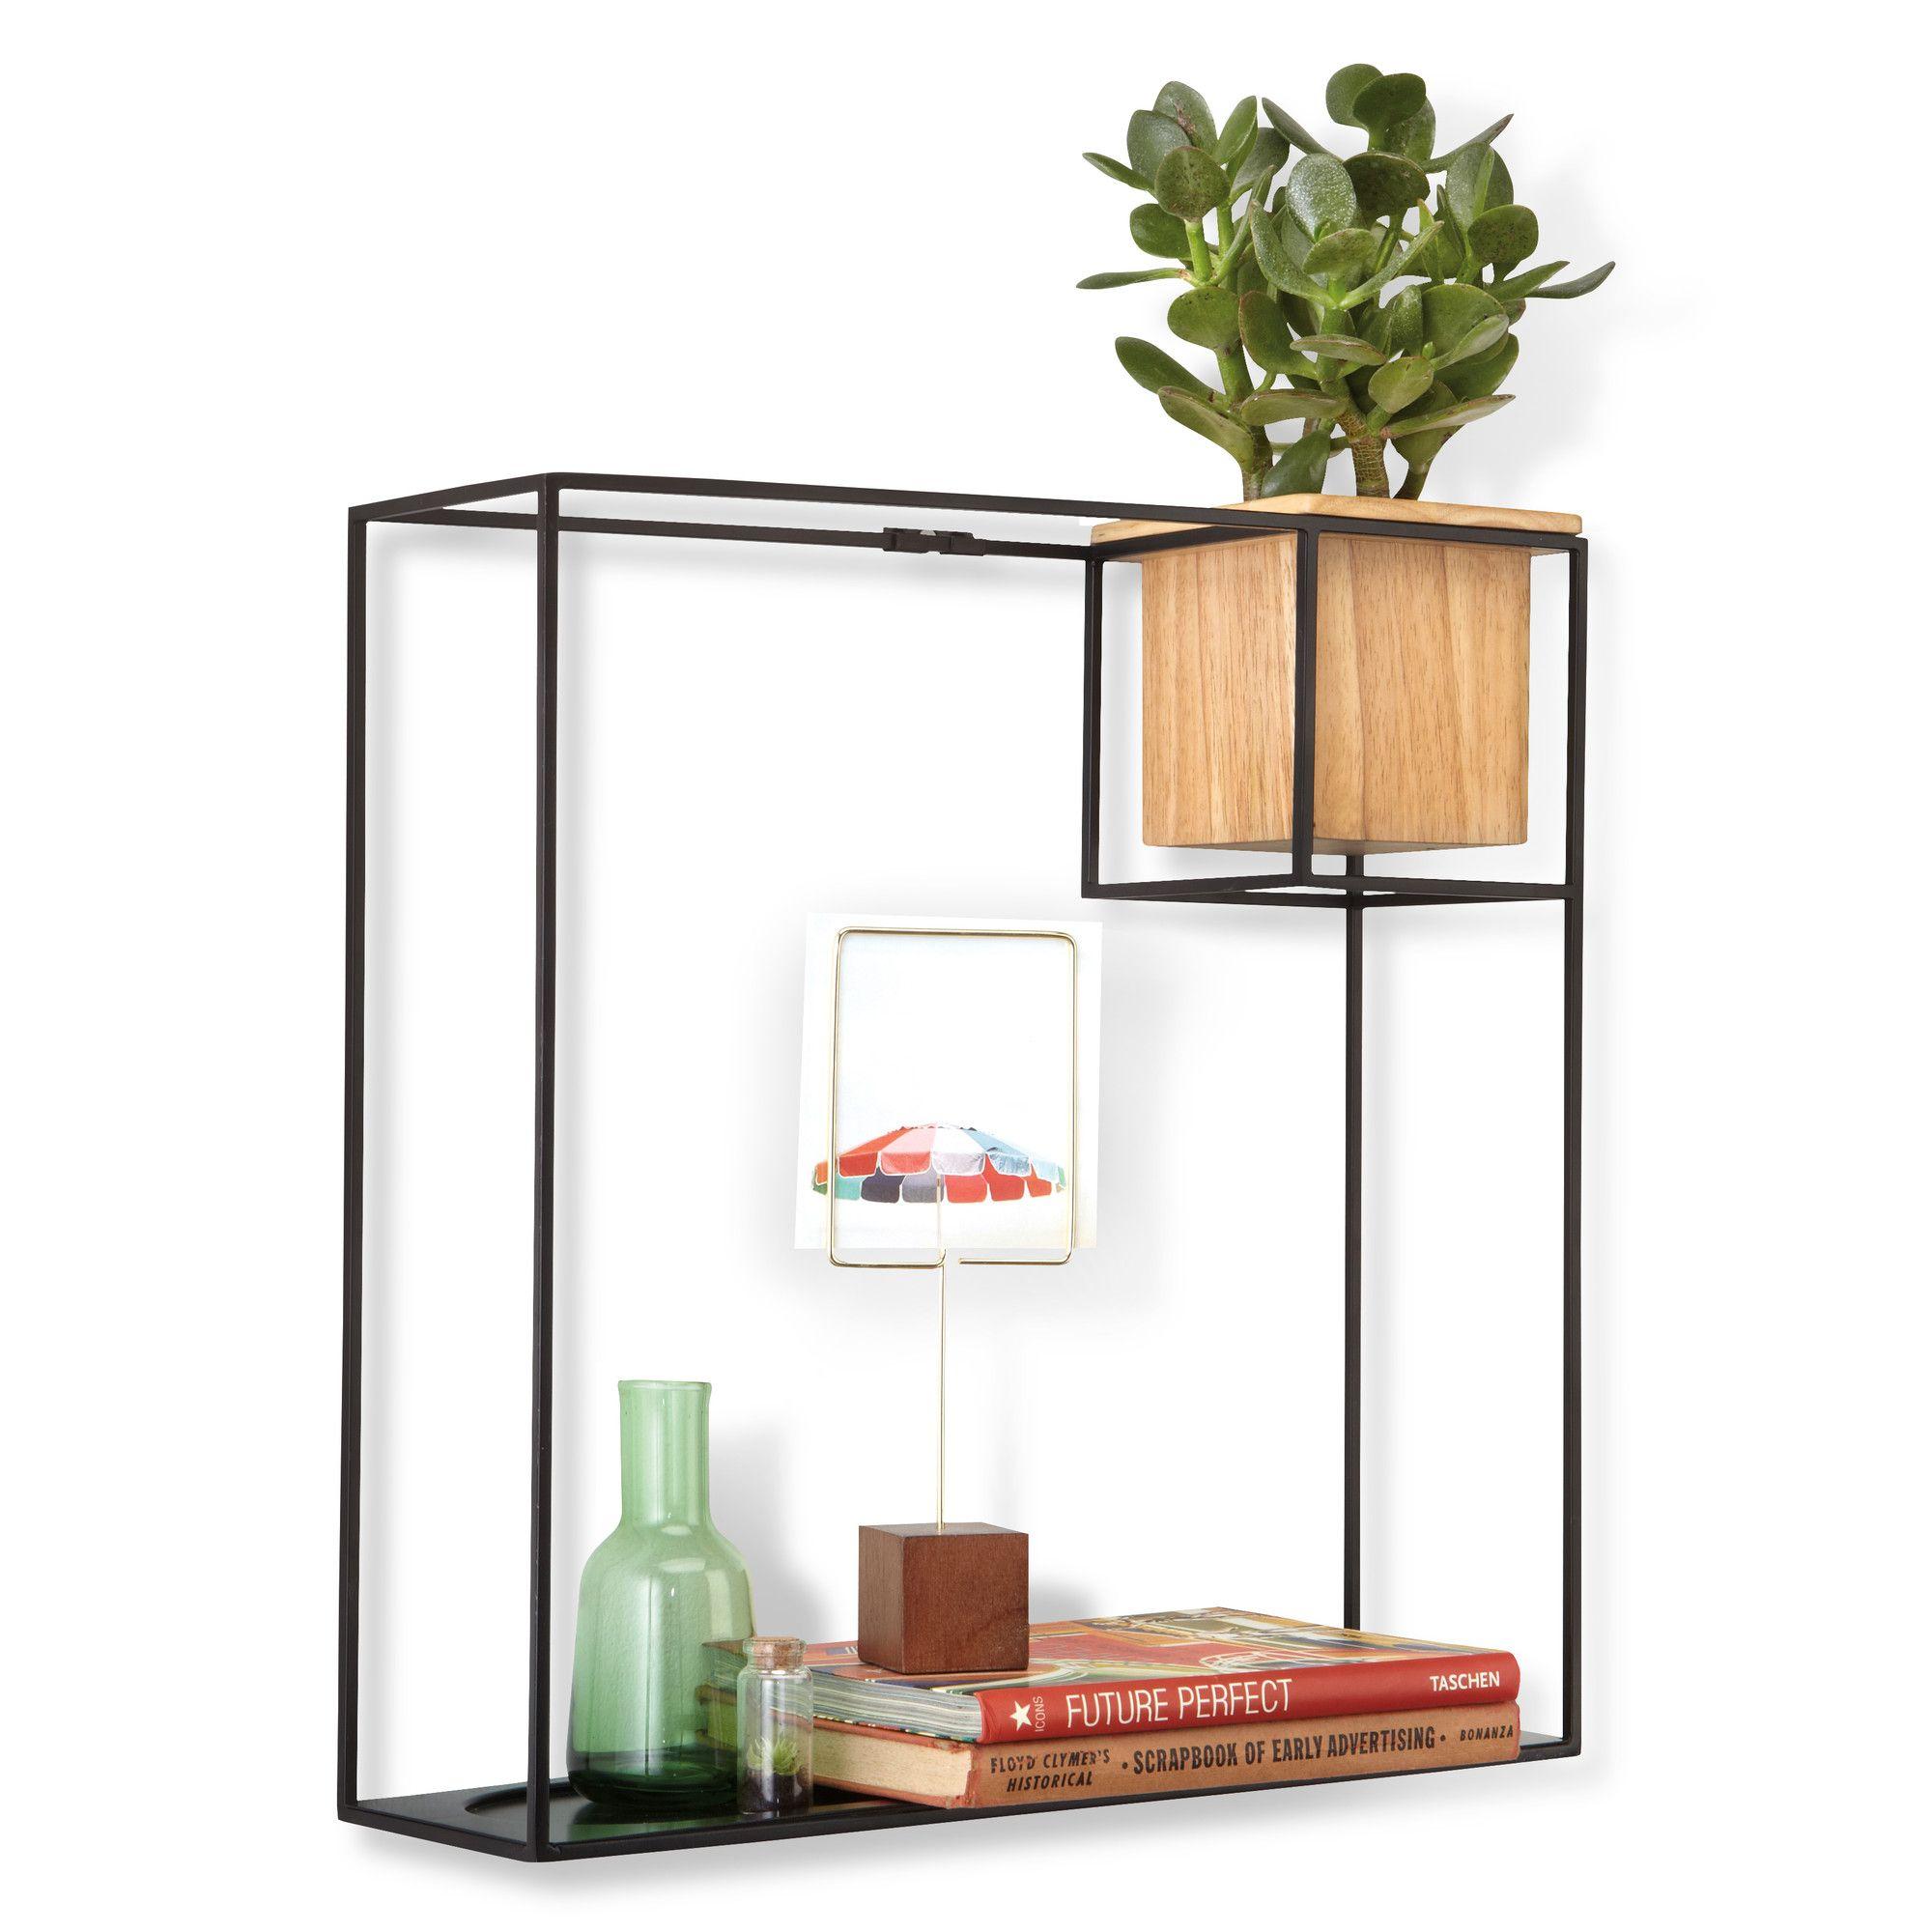 Cubist Floating Wall Shelf With Images Minimalist Shelves